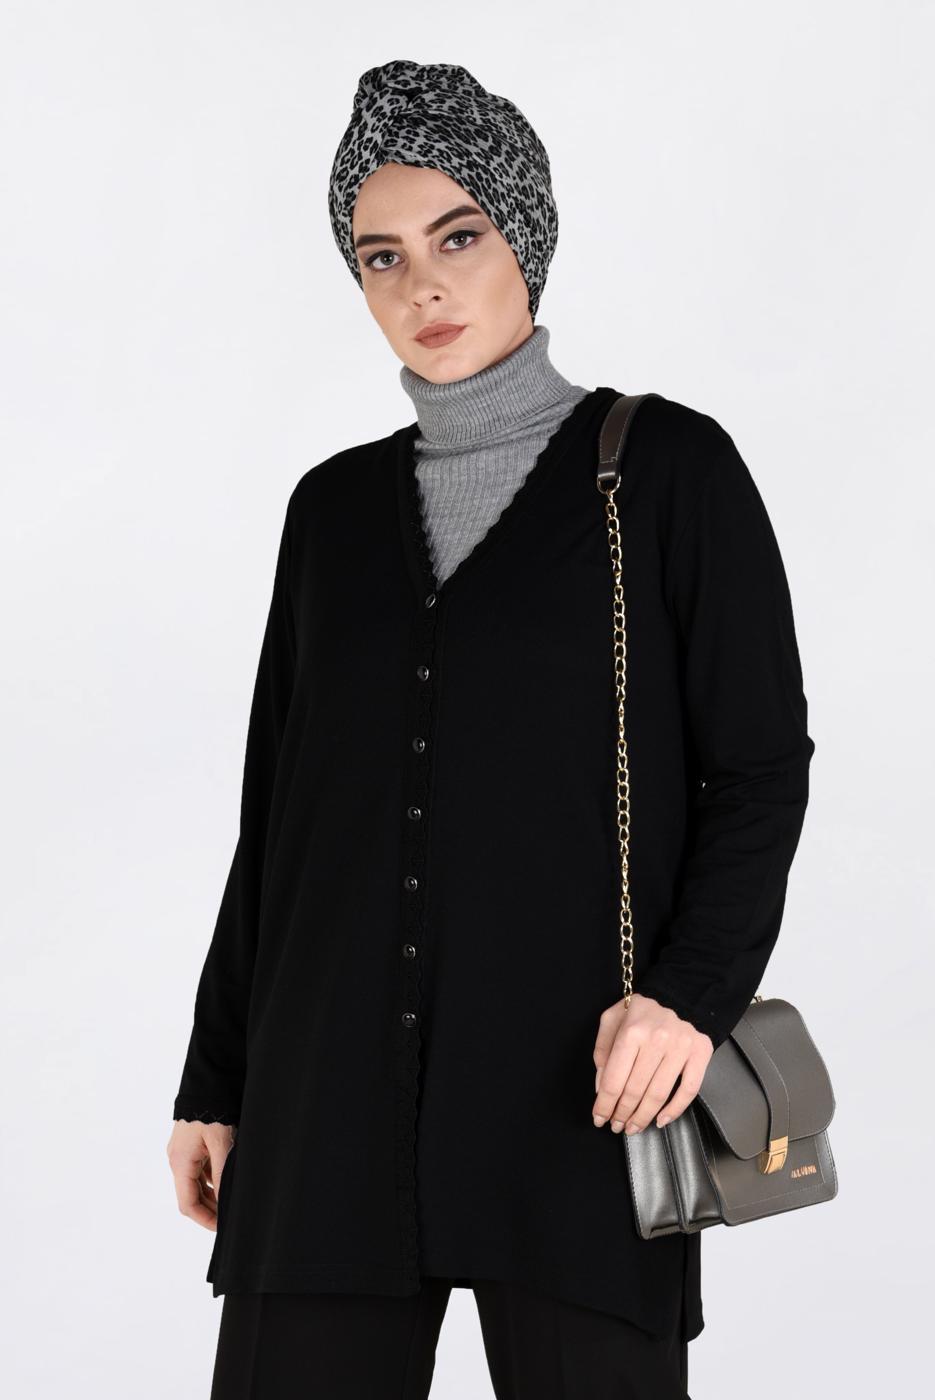 Bayan SİYAH DÜĞMELİ TRİKO CEKET 2772